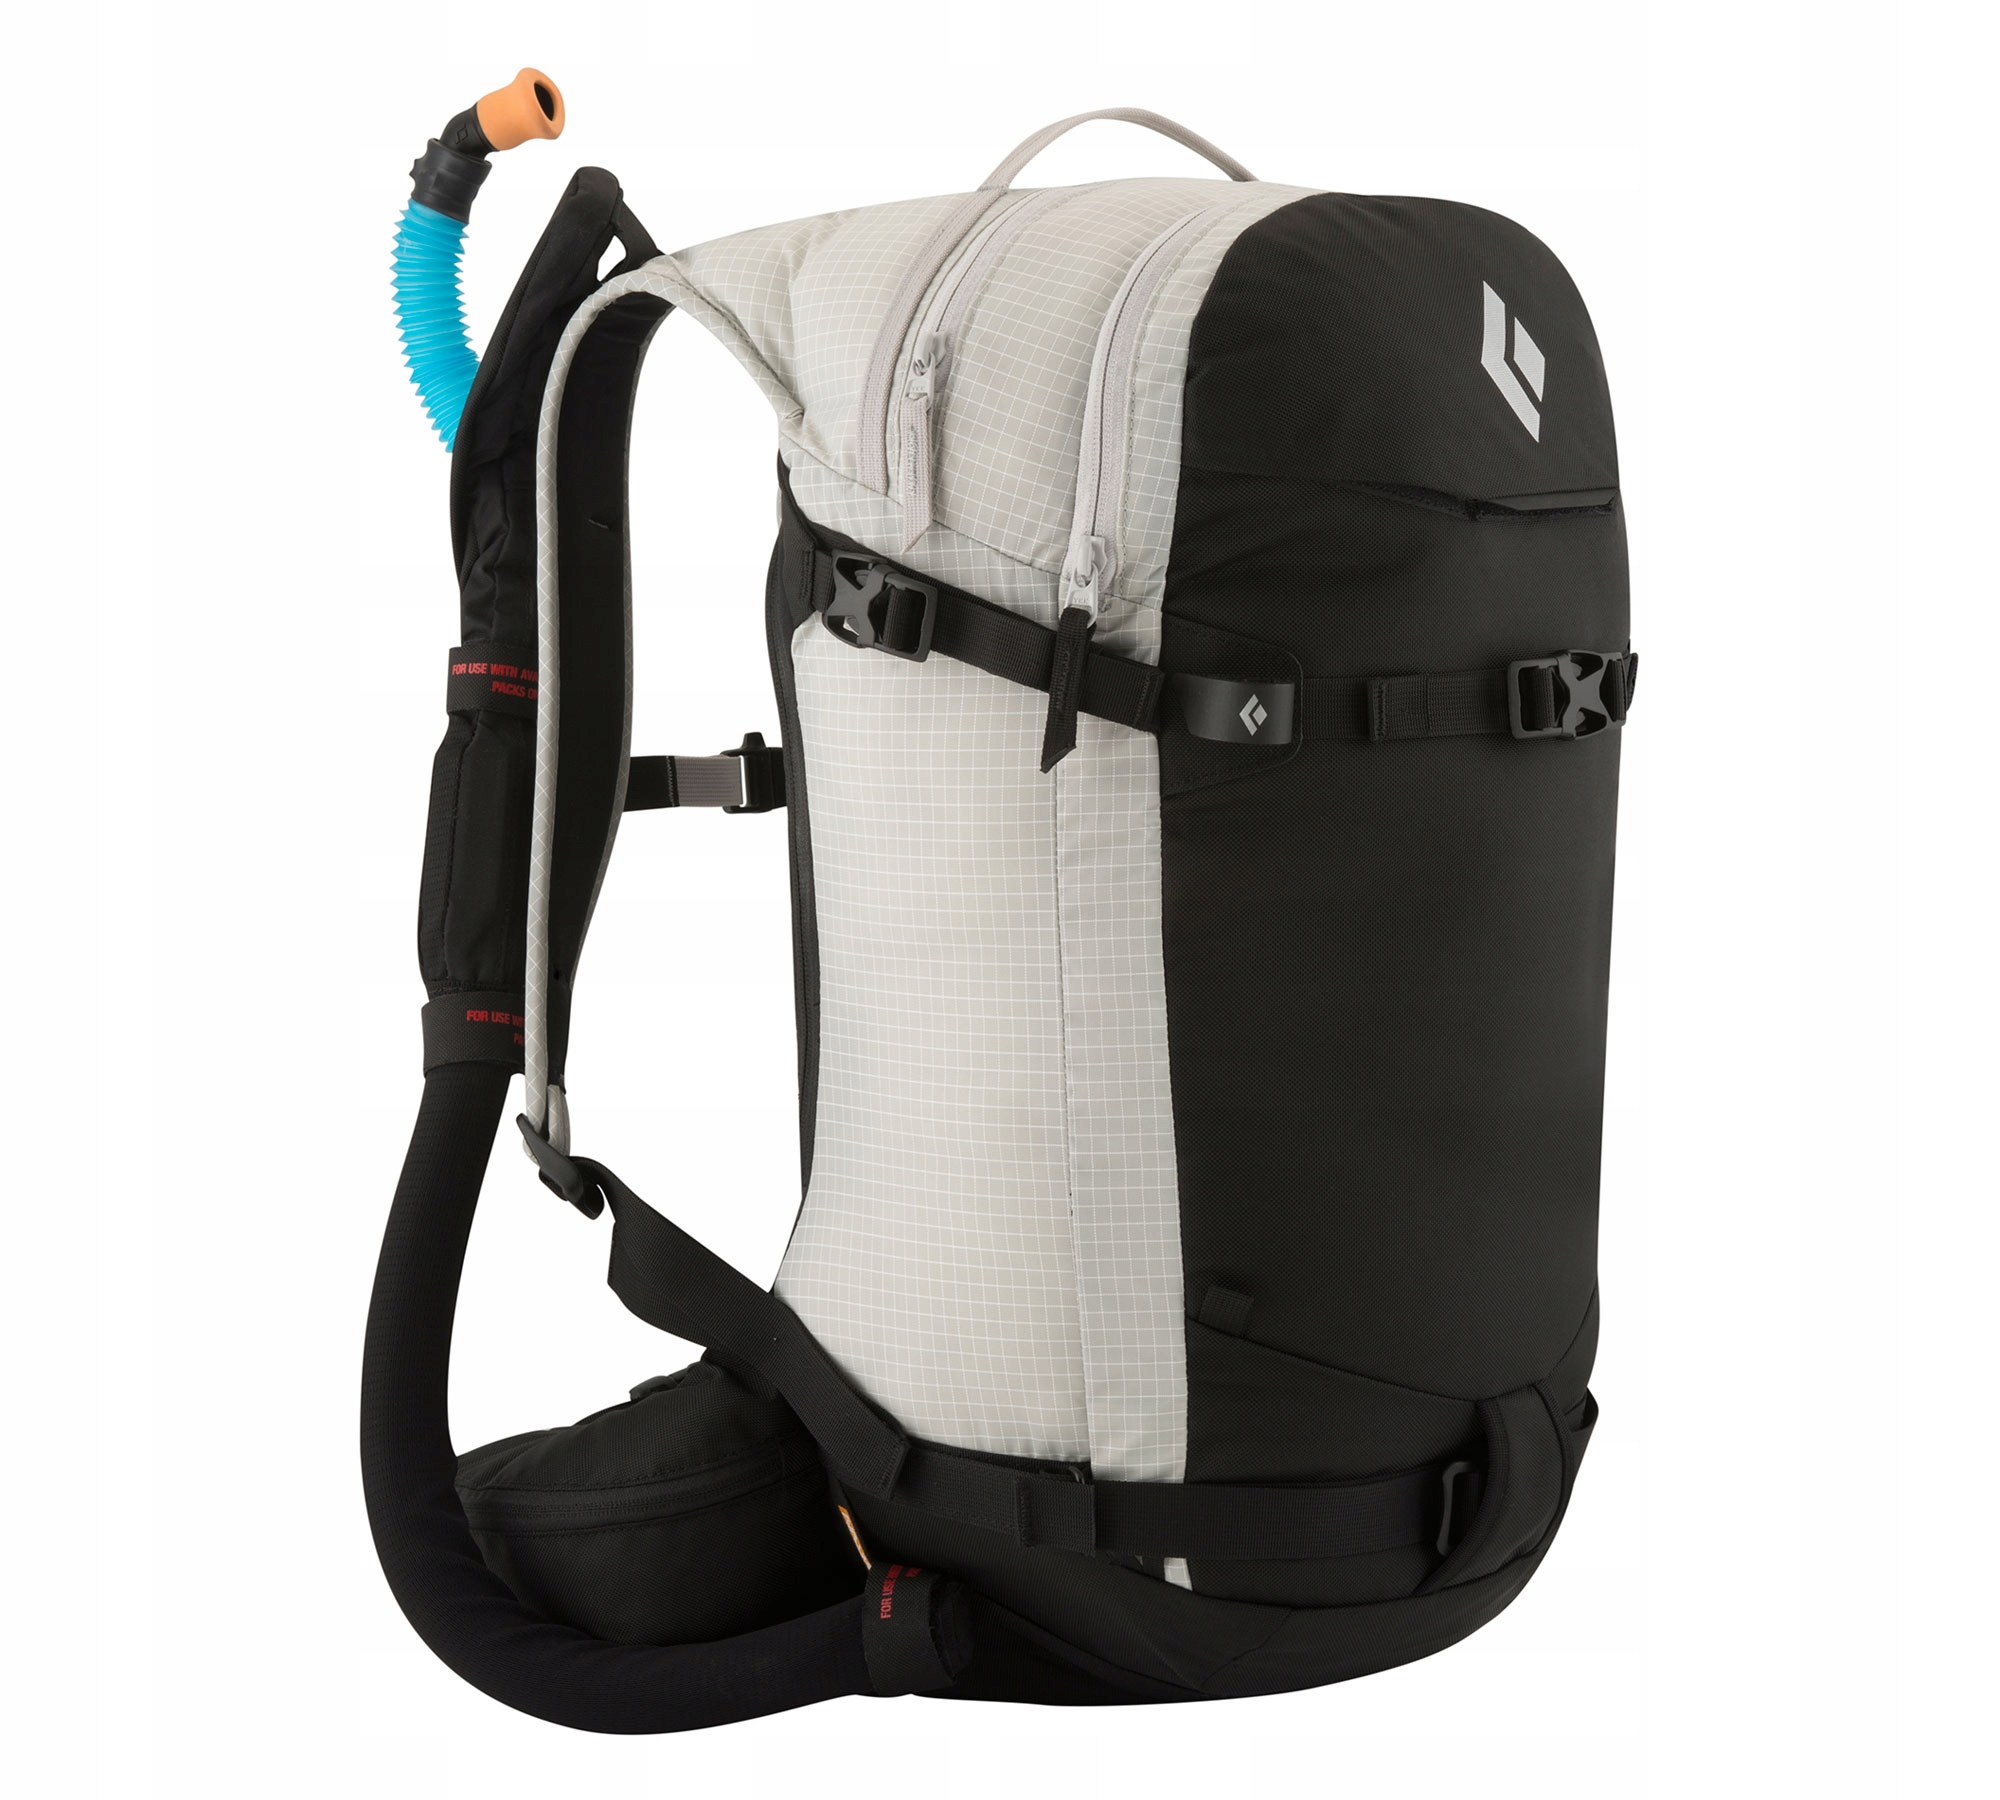 Plecak narciarski Black Diamond Dawn Patrol 32 #